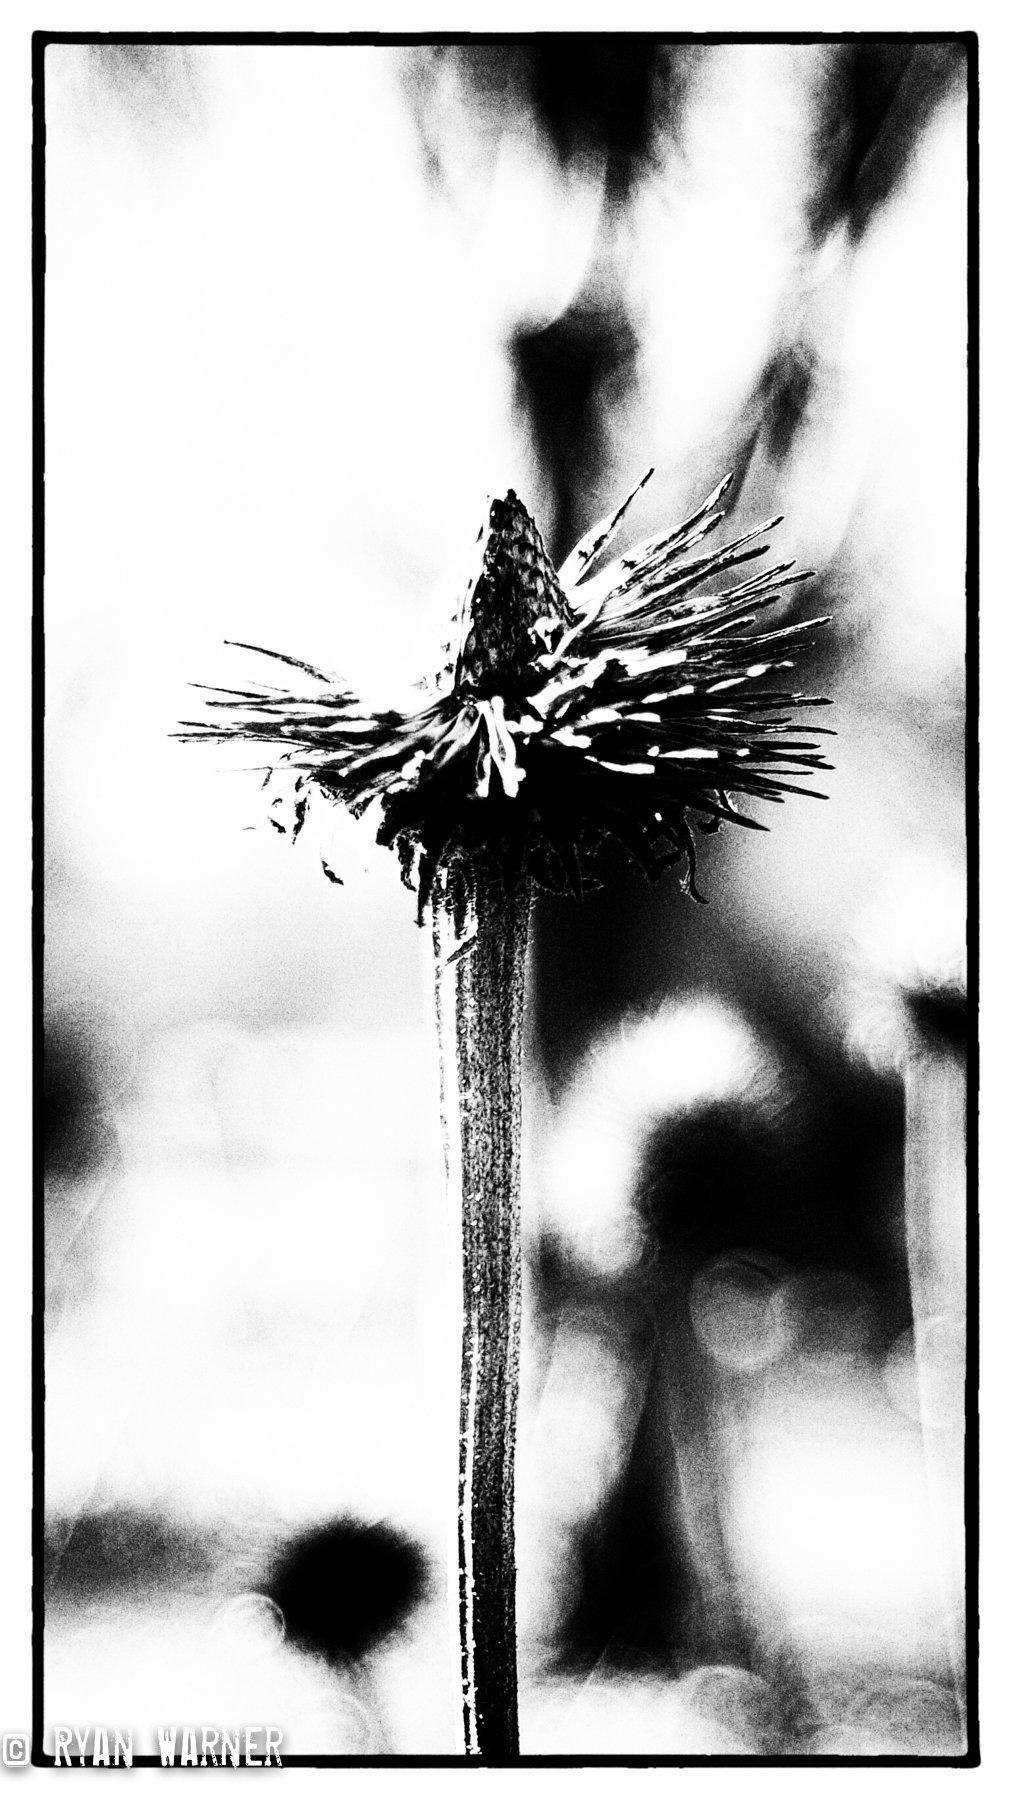 Ryan Warner - Photography - Dead Flowers